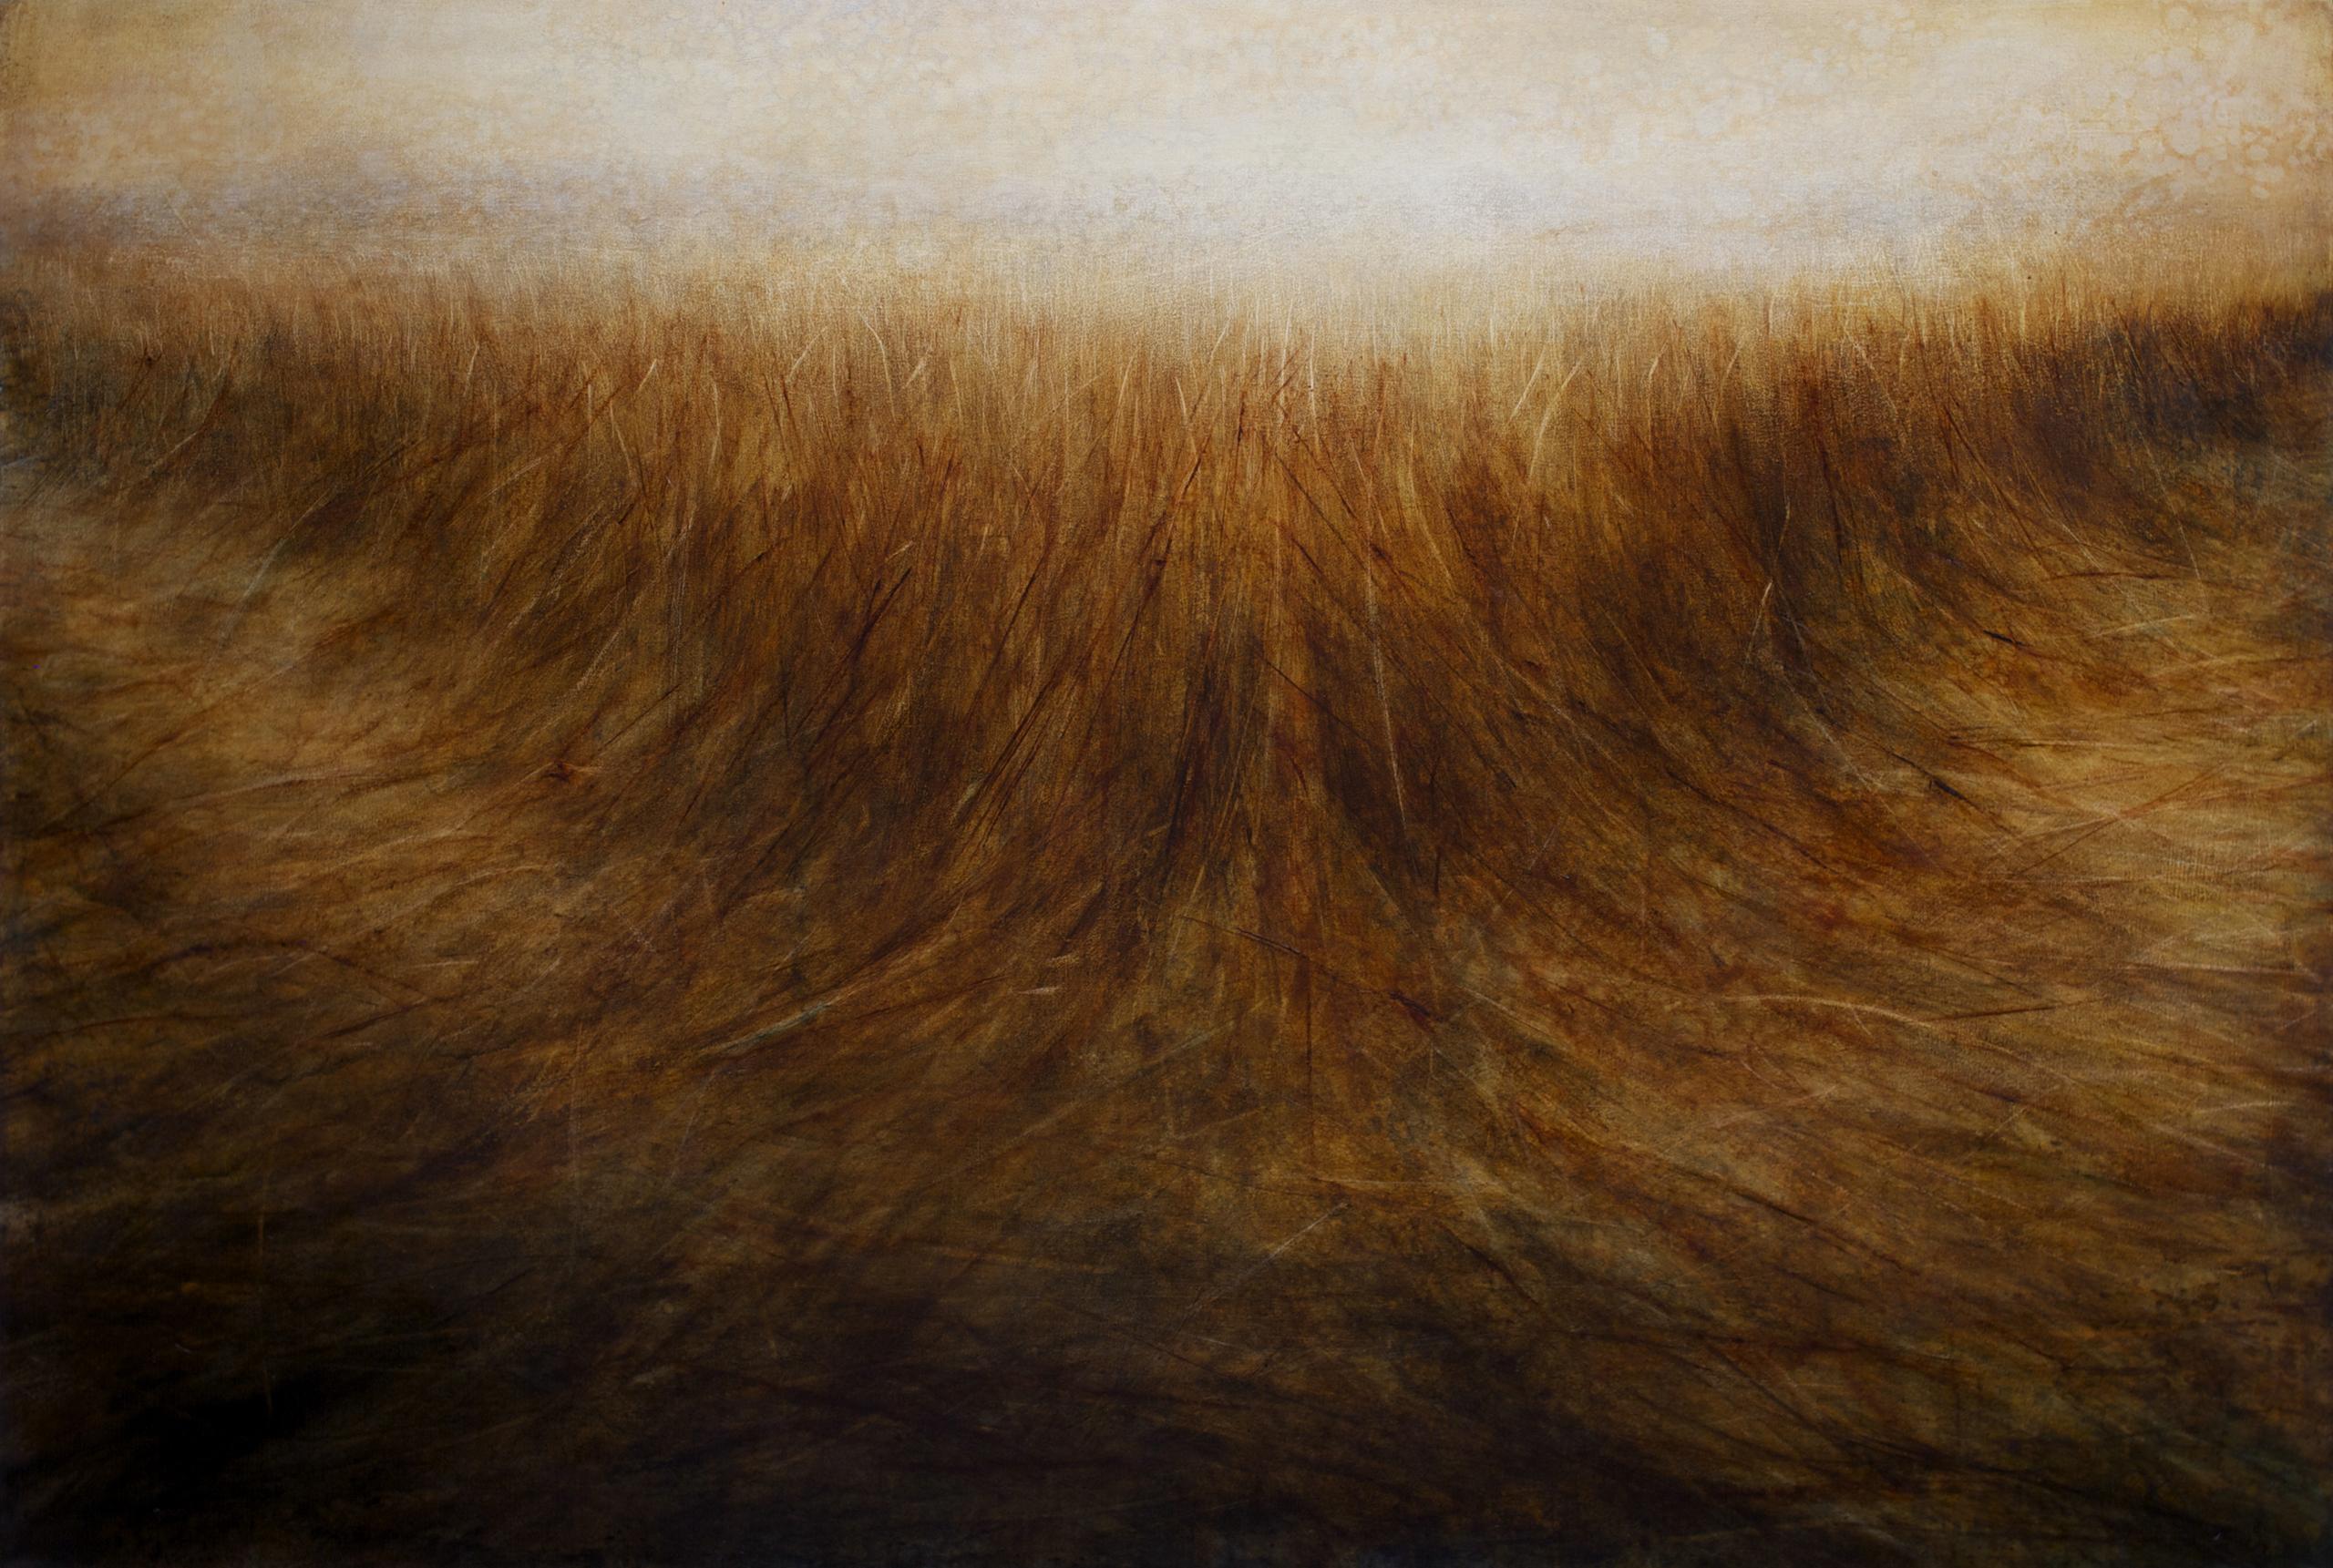 "Maya Kulenovic: GRASSLANDS / DELTA, 2017, oil on canvas, 54"" x 78.2"", 137.5cm x 198.5cm. 'Land' Series; 'Grasslands' Series."